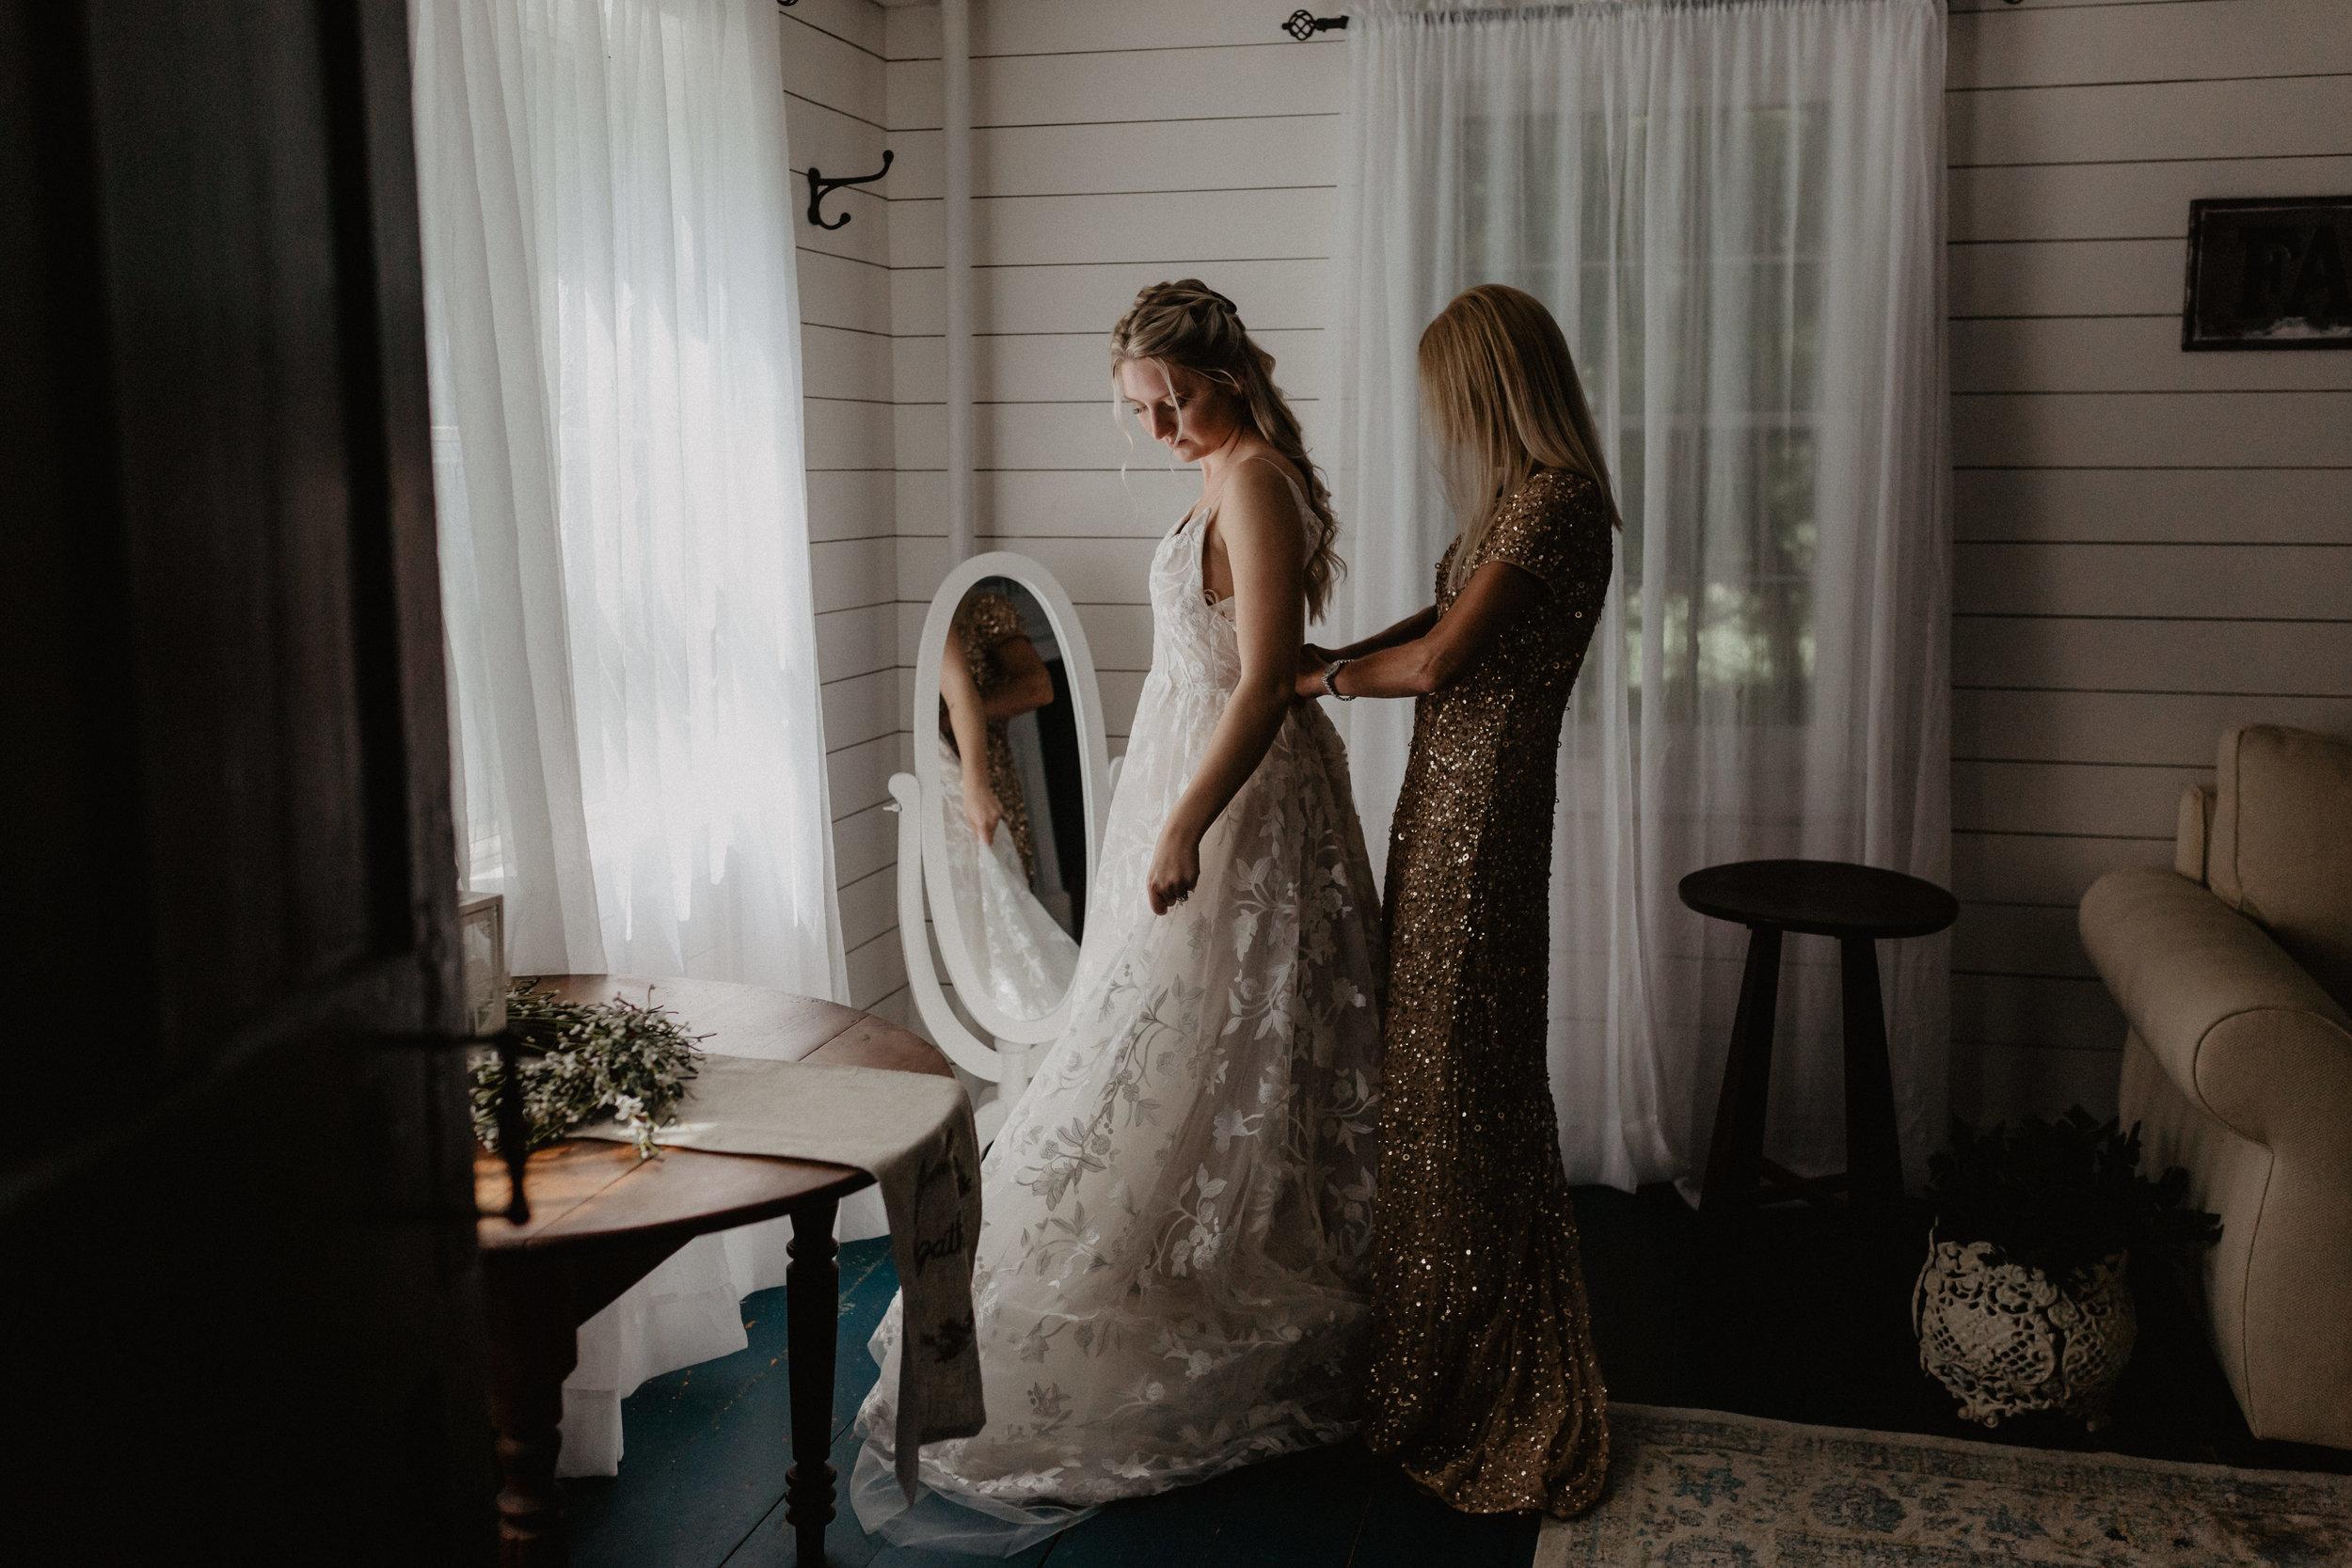 greywacke-meadows-wedding-10.jpg